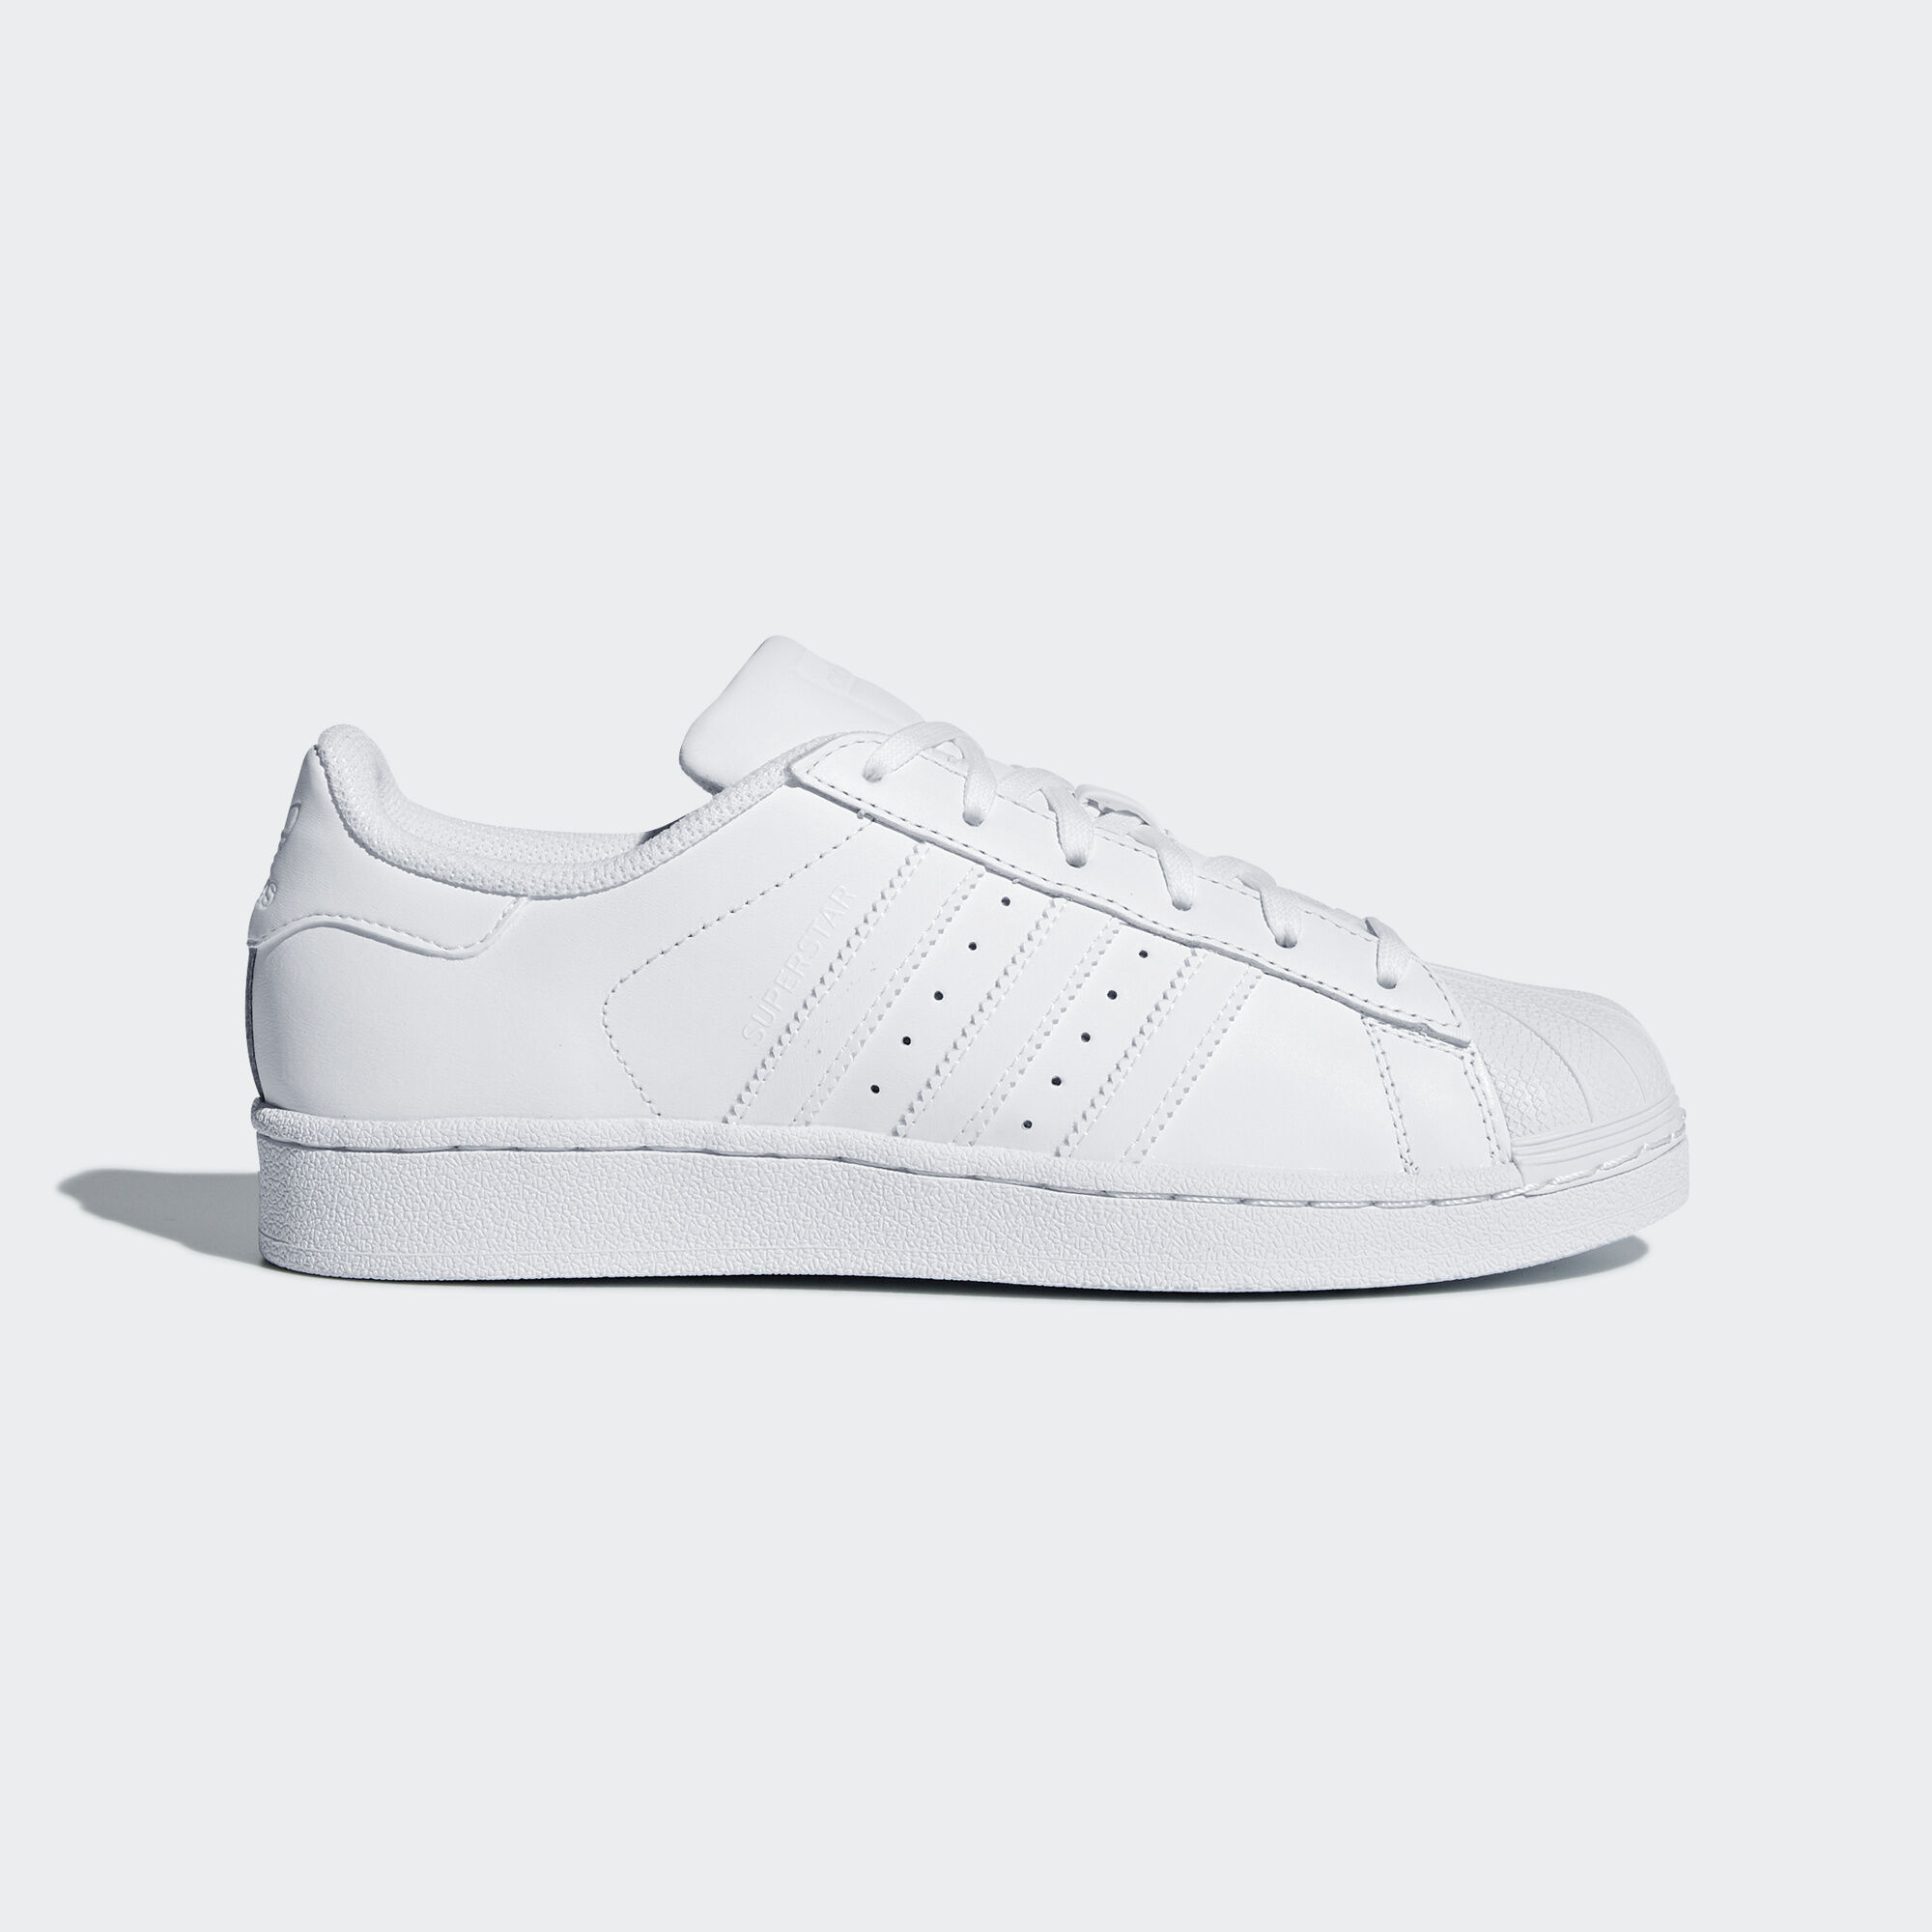 Adidas Little Kids Superstar Sneakers Size